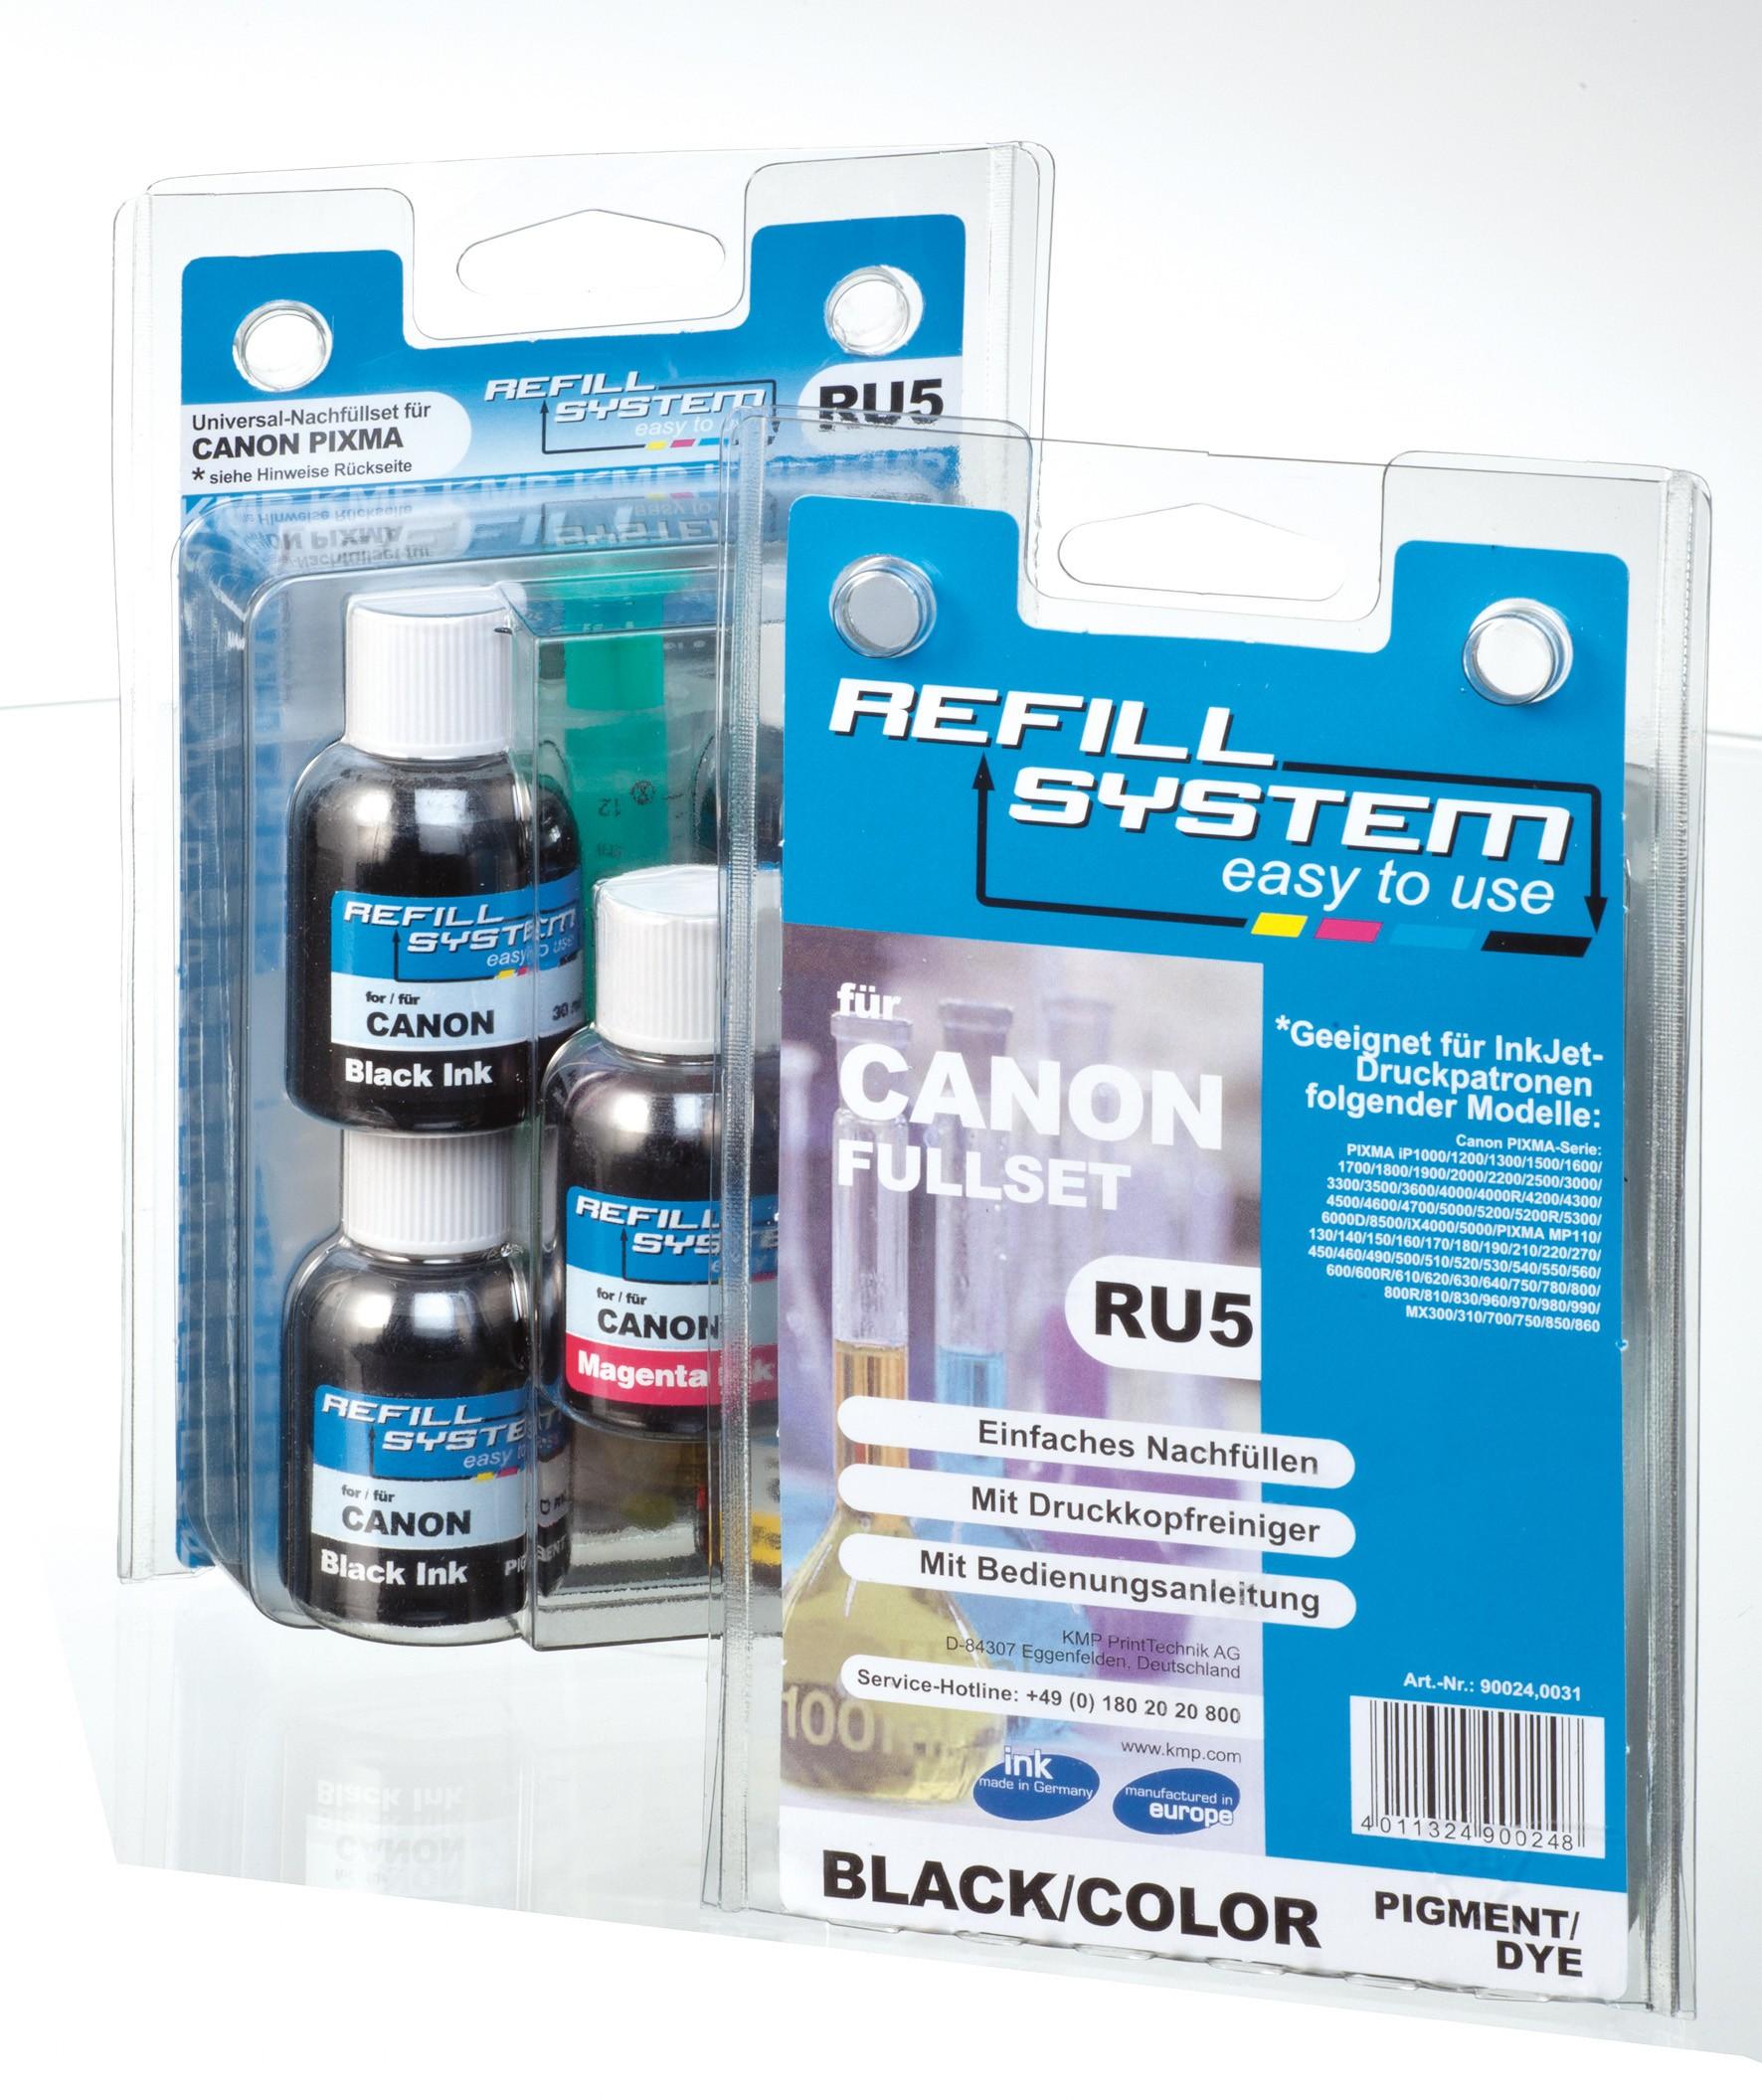 KMP Refill-System RC6 für Canon Pixma iP 1600 / 2200 Fullset